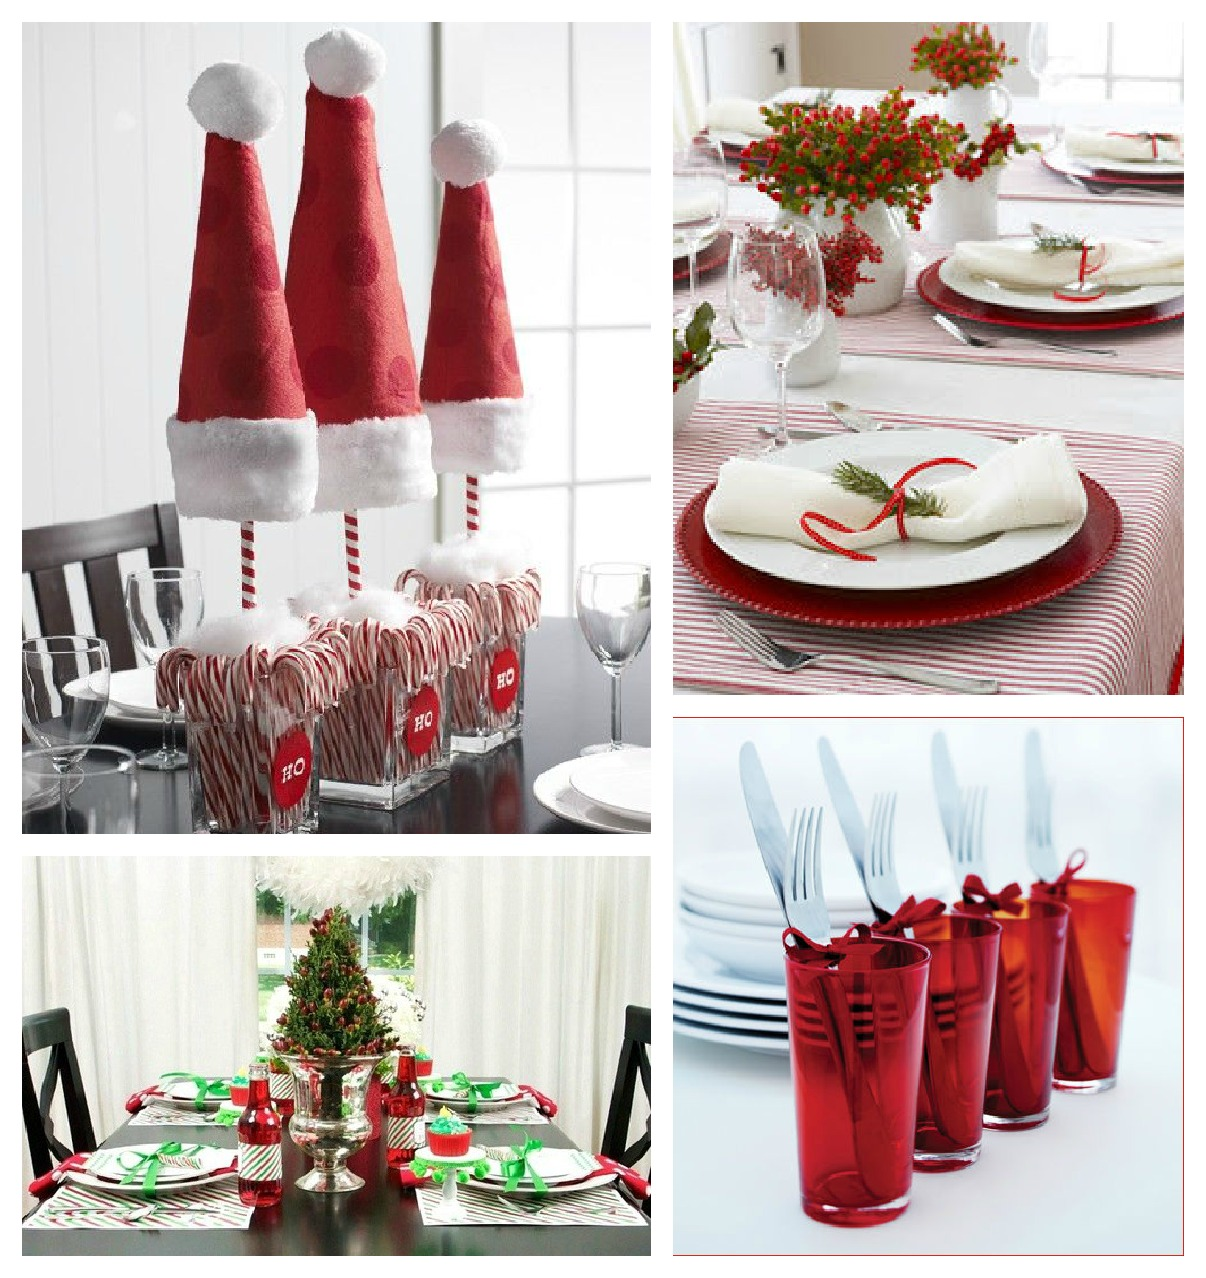 decoracao festa natal:tellastella festa: Ideias originais e criativas para o Natal